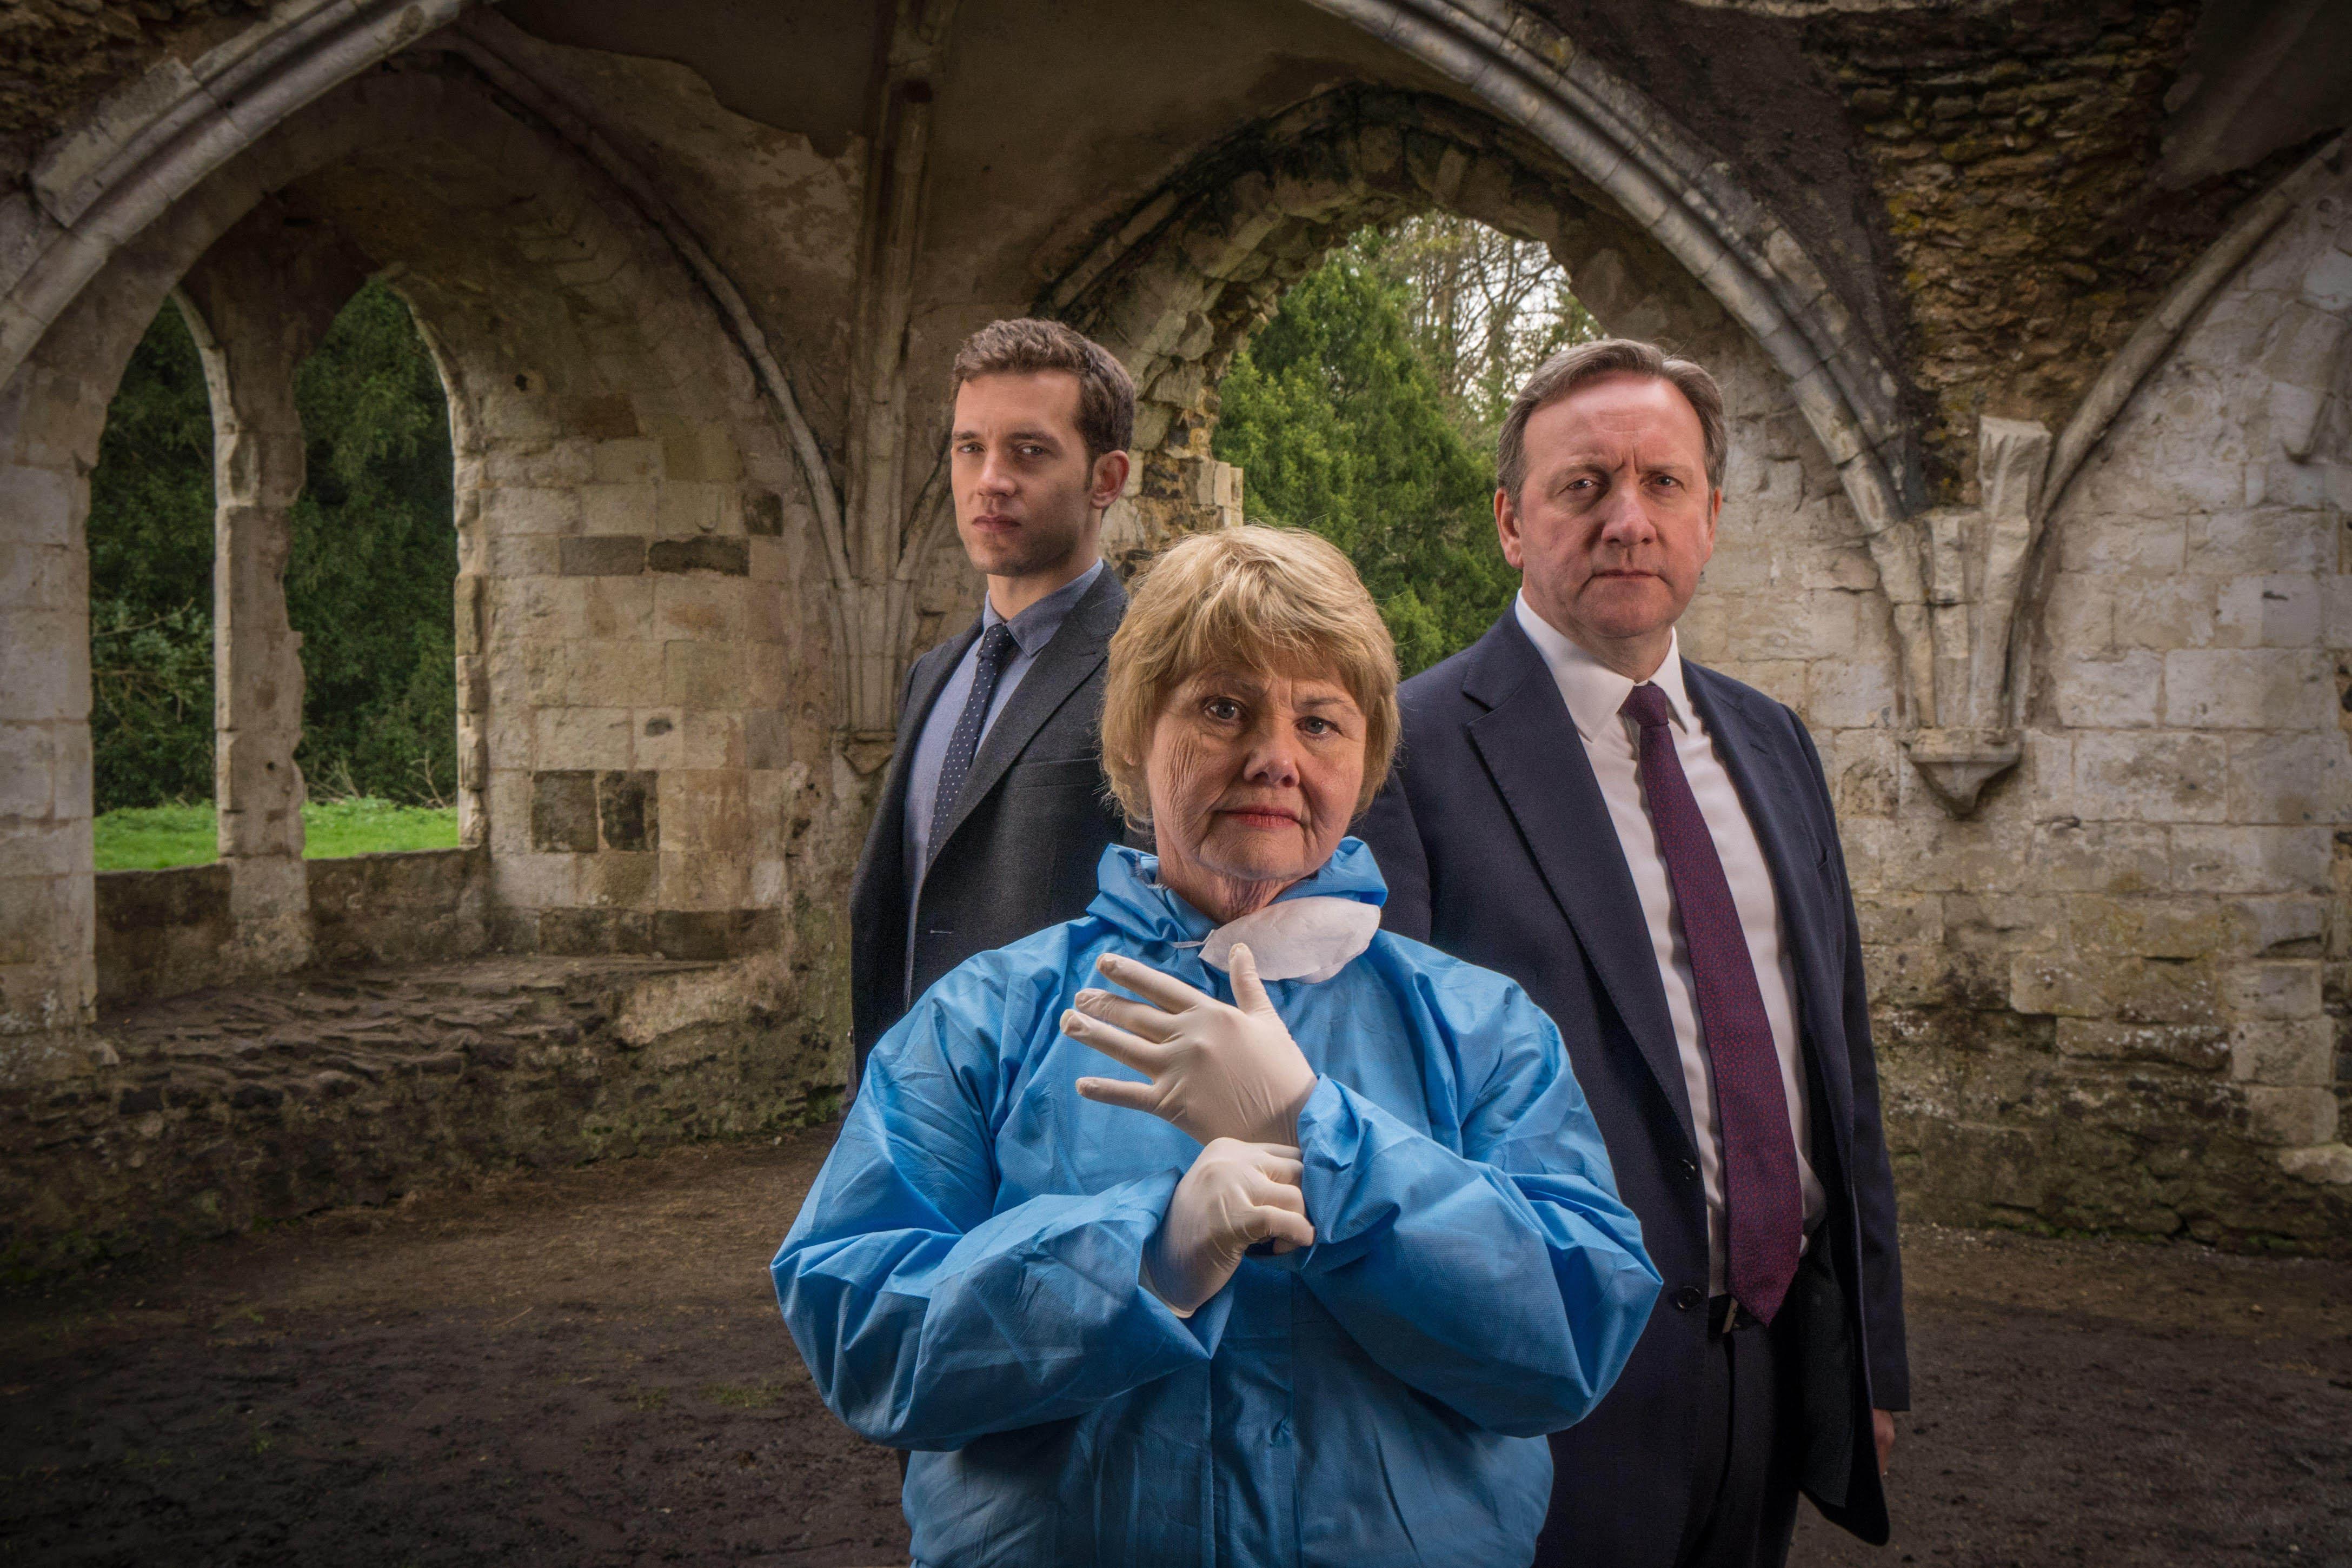 Annette Badland joins Midsomer Murders